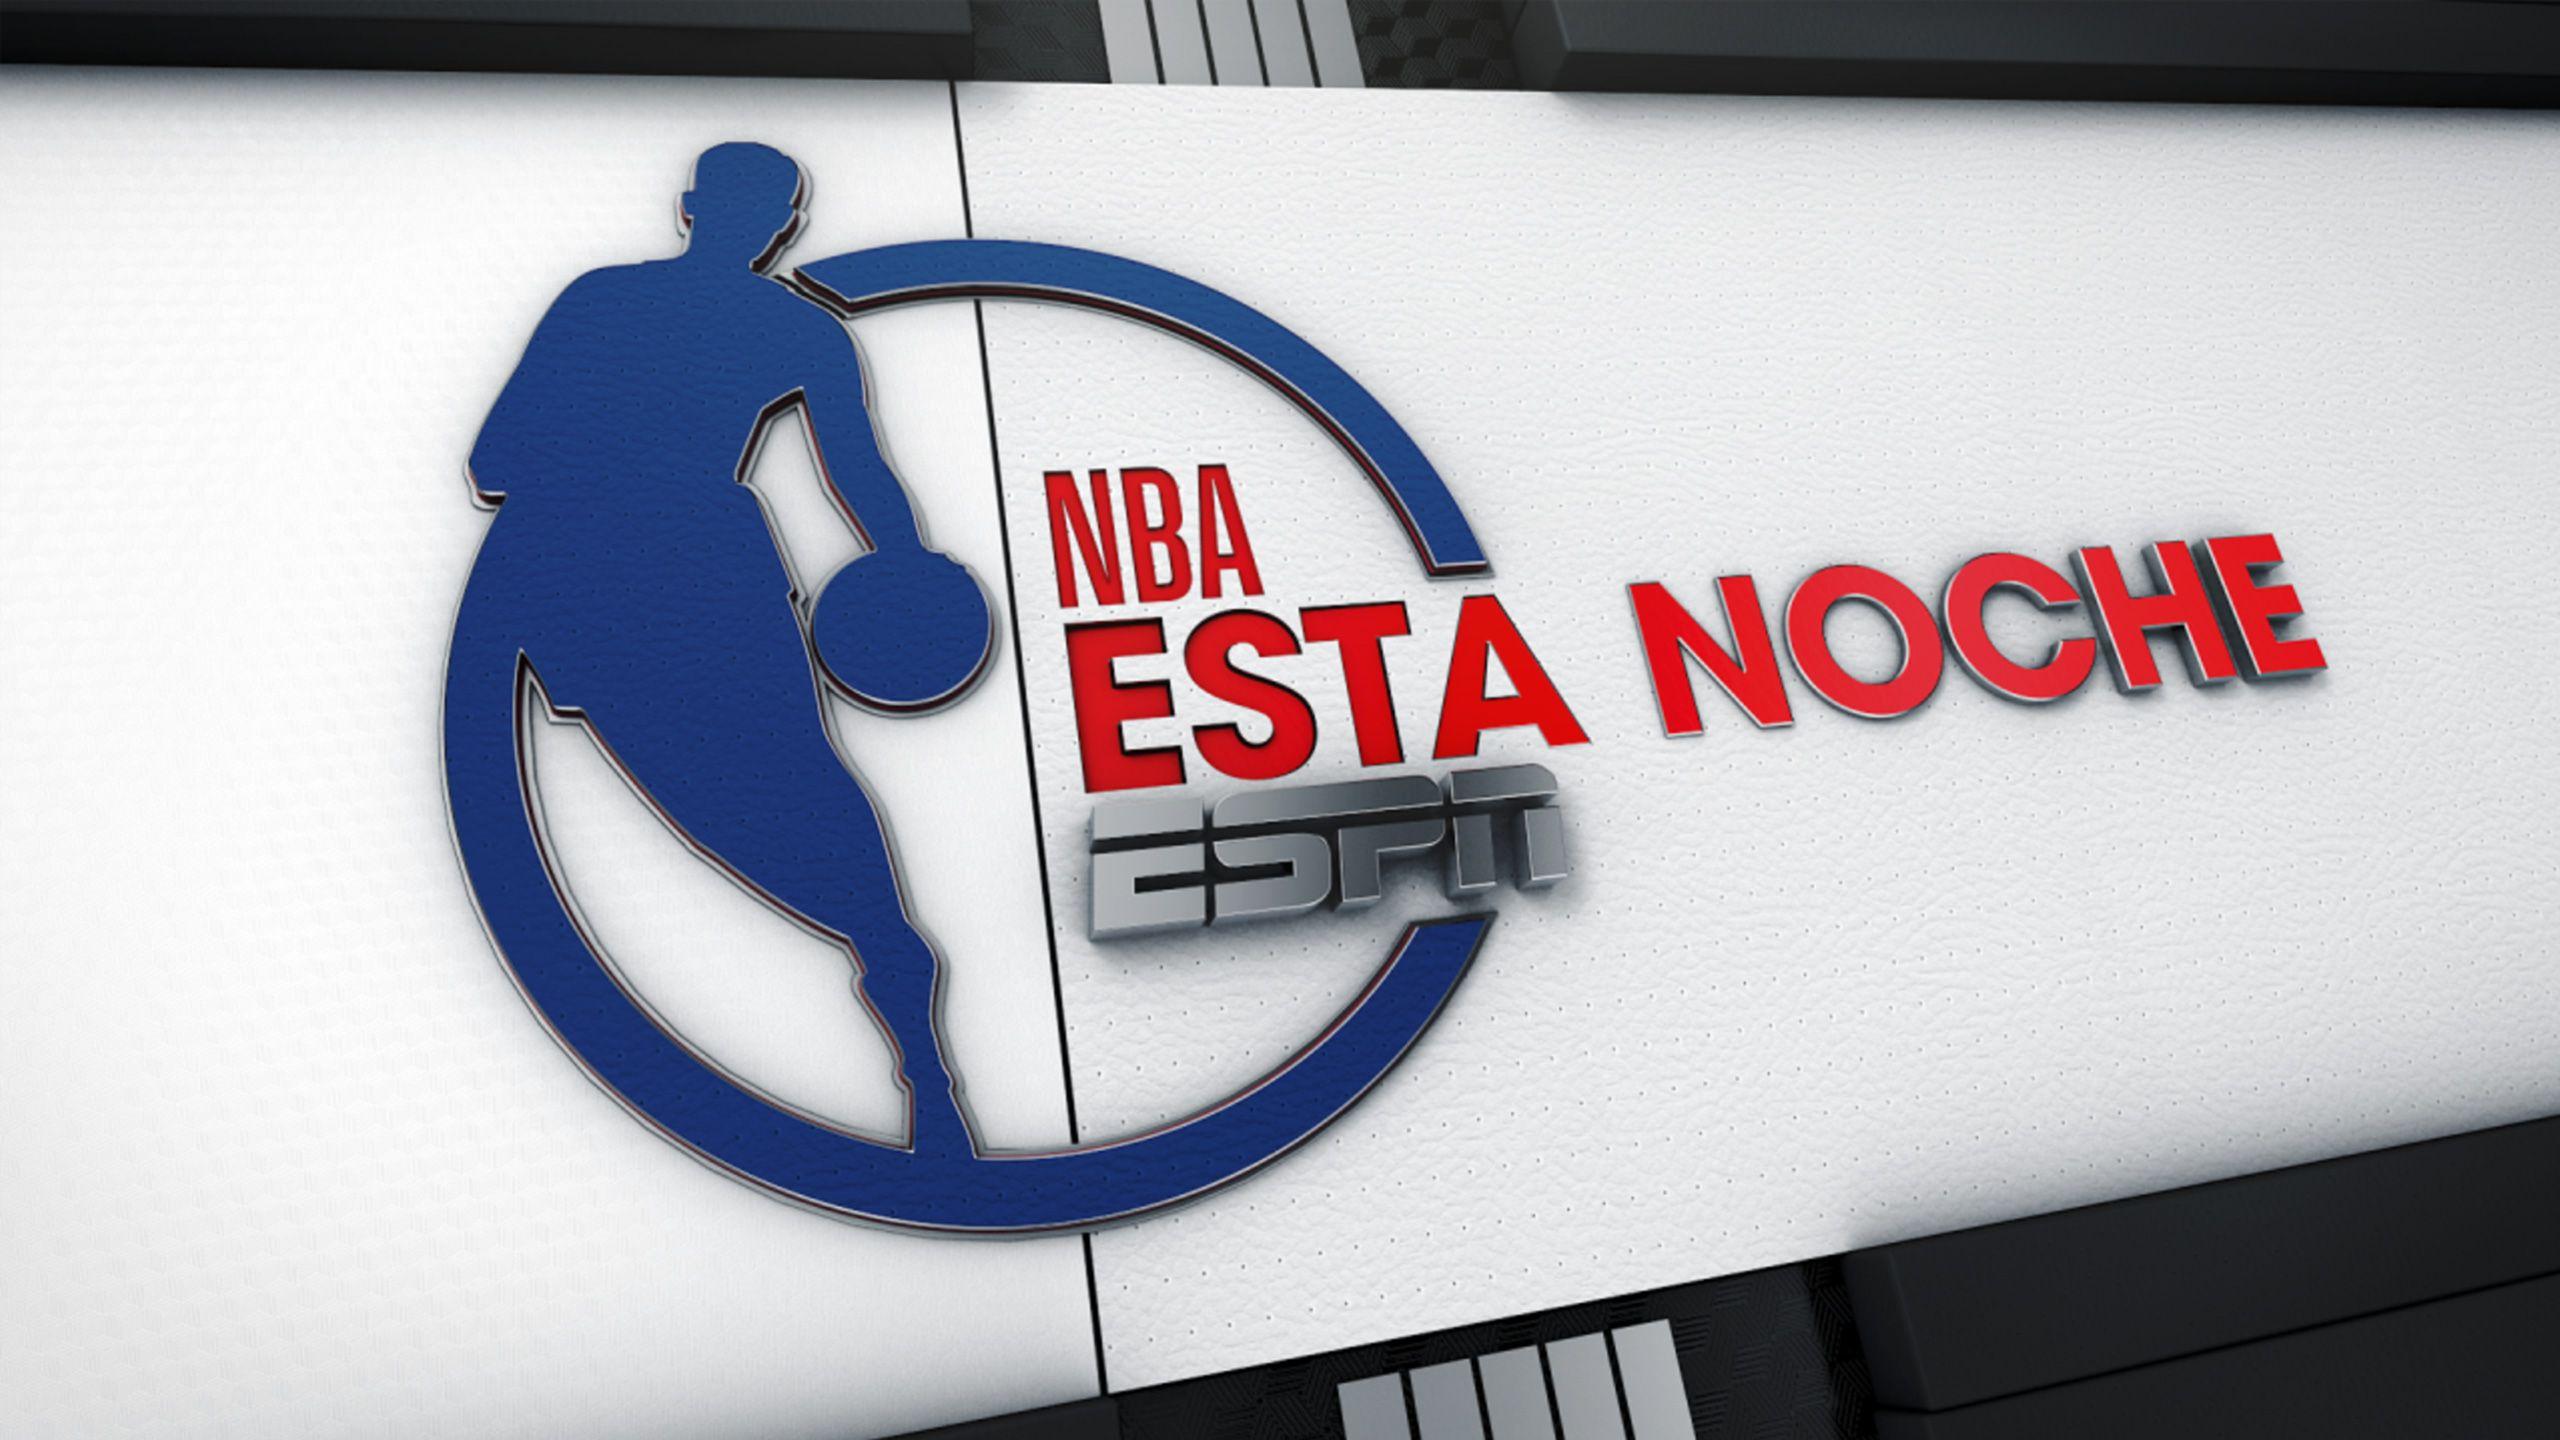 NBA Esta Noche